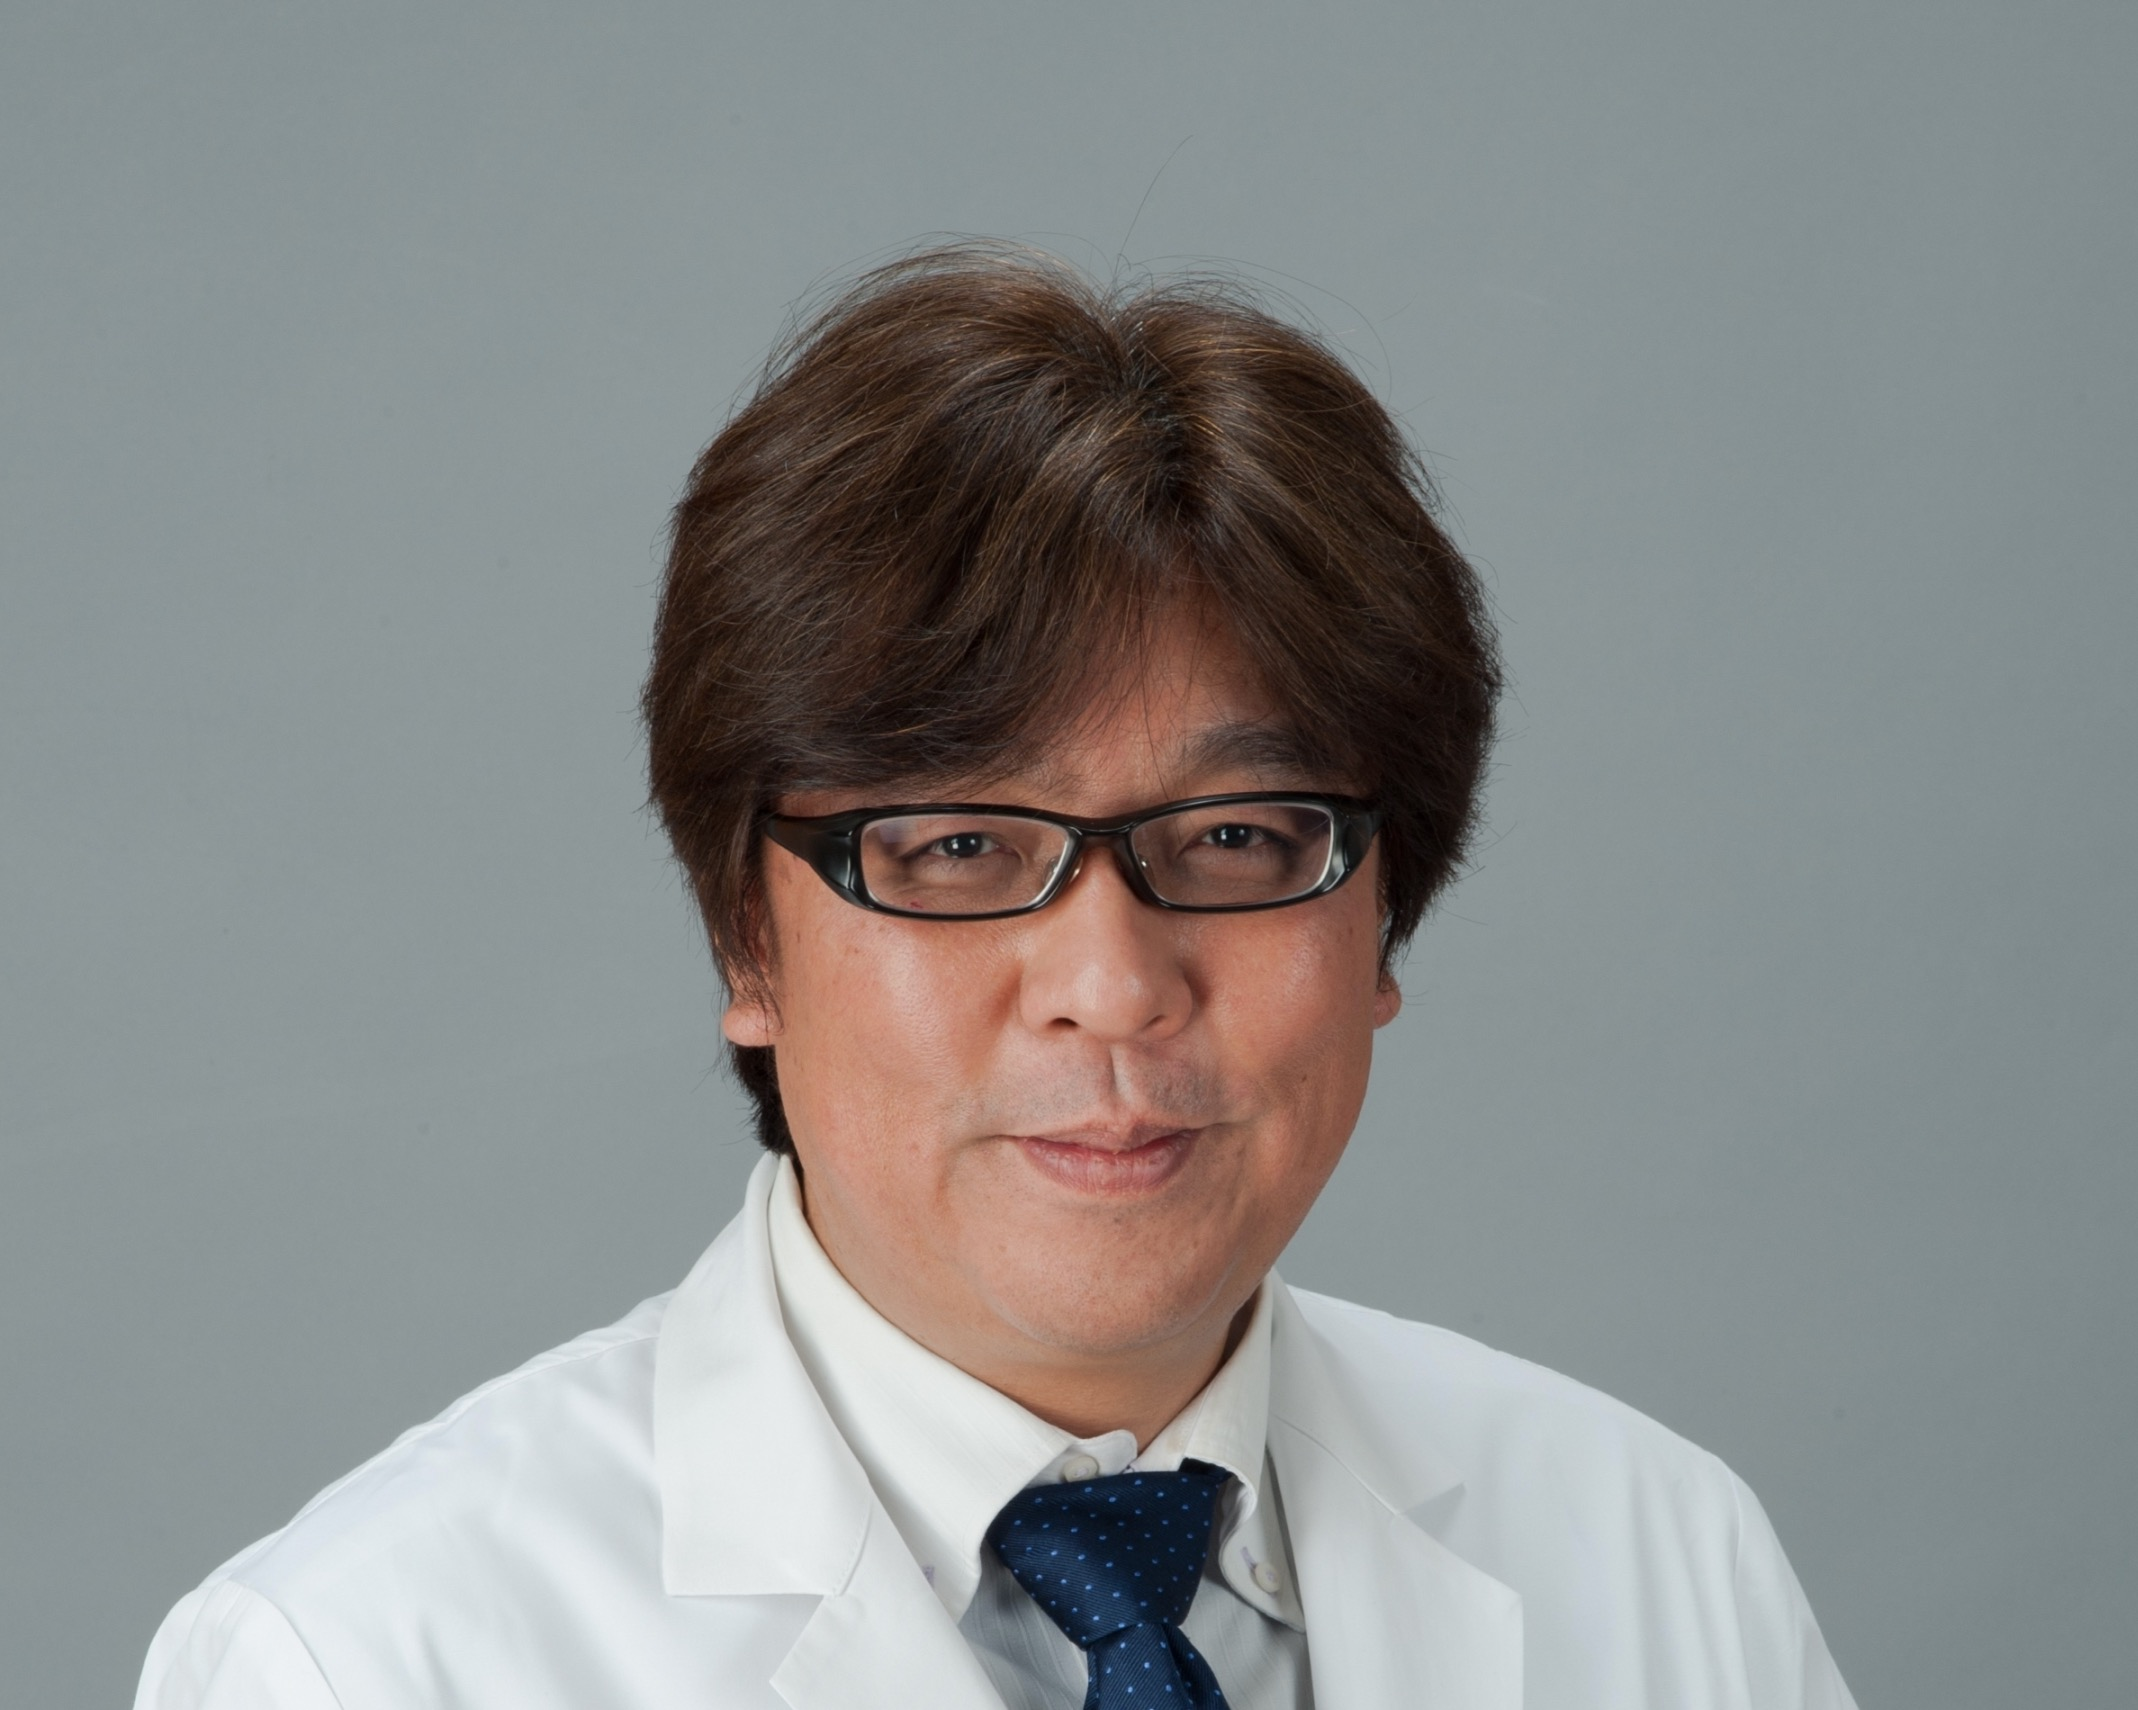 国立がん研究センター東病院 消化管内科長 吉野 孝之医師